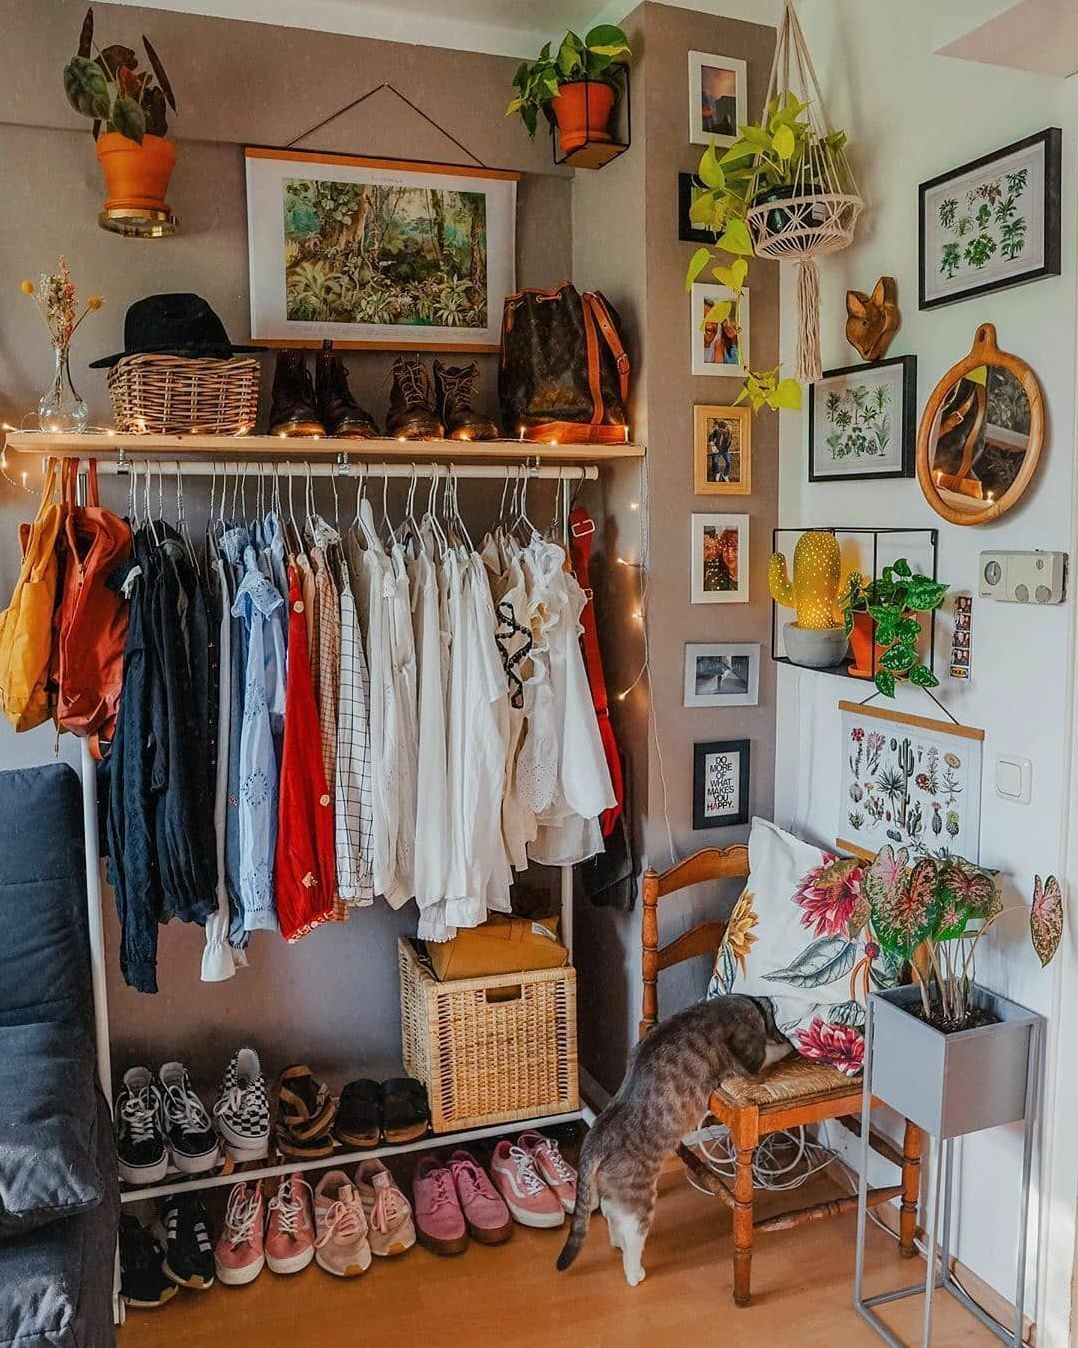 8 Impressive Small Apartment Decorating Ideas On A Budget - futurian